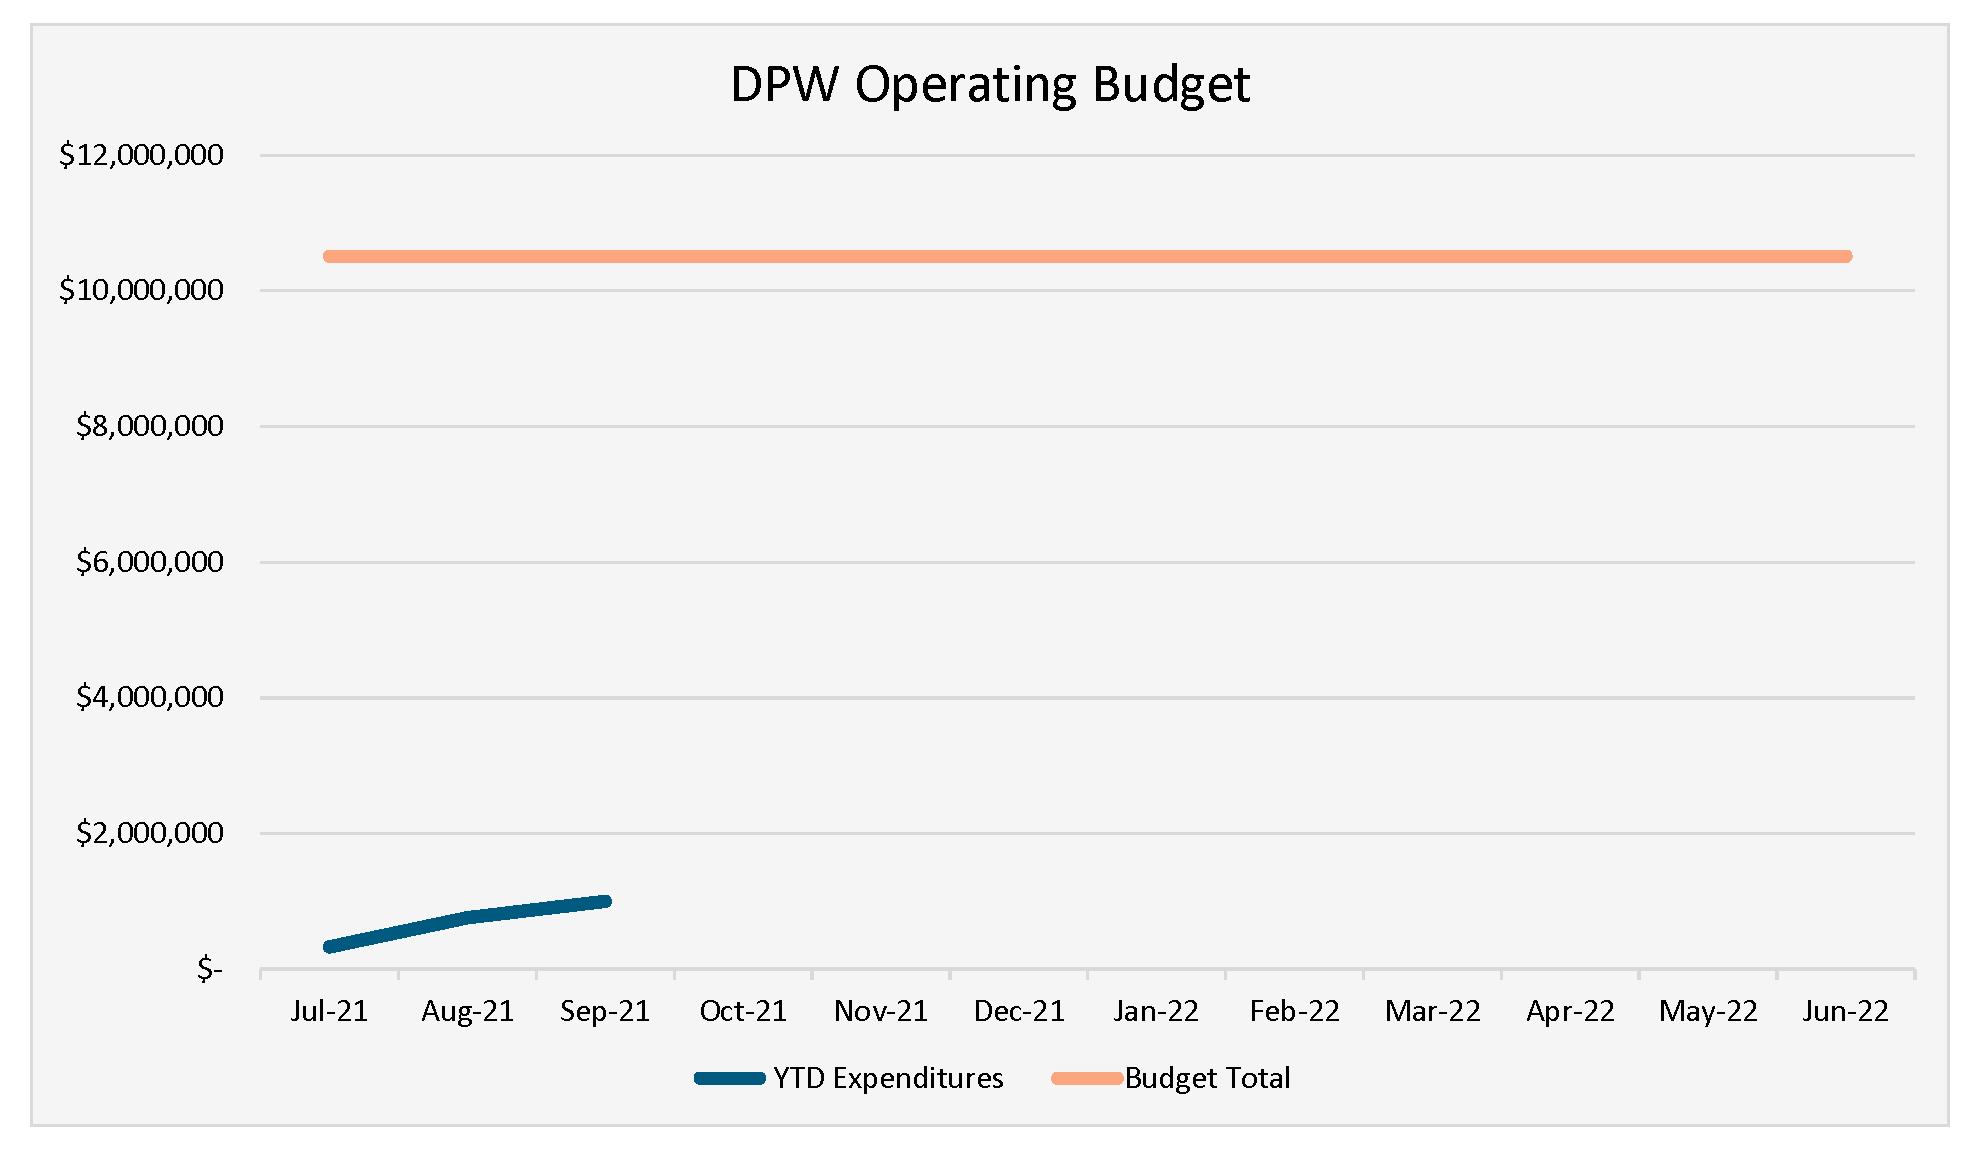 DPW Operating Budget YTD September 2021